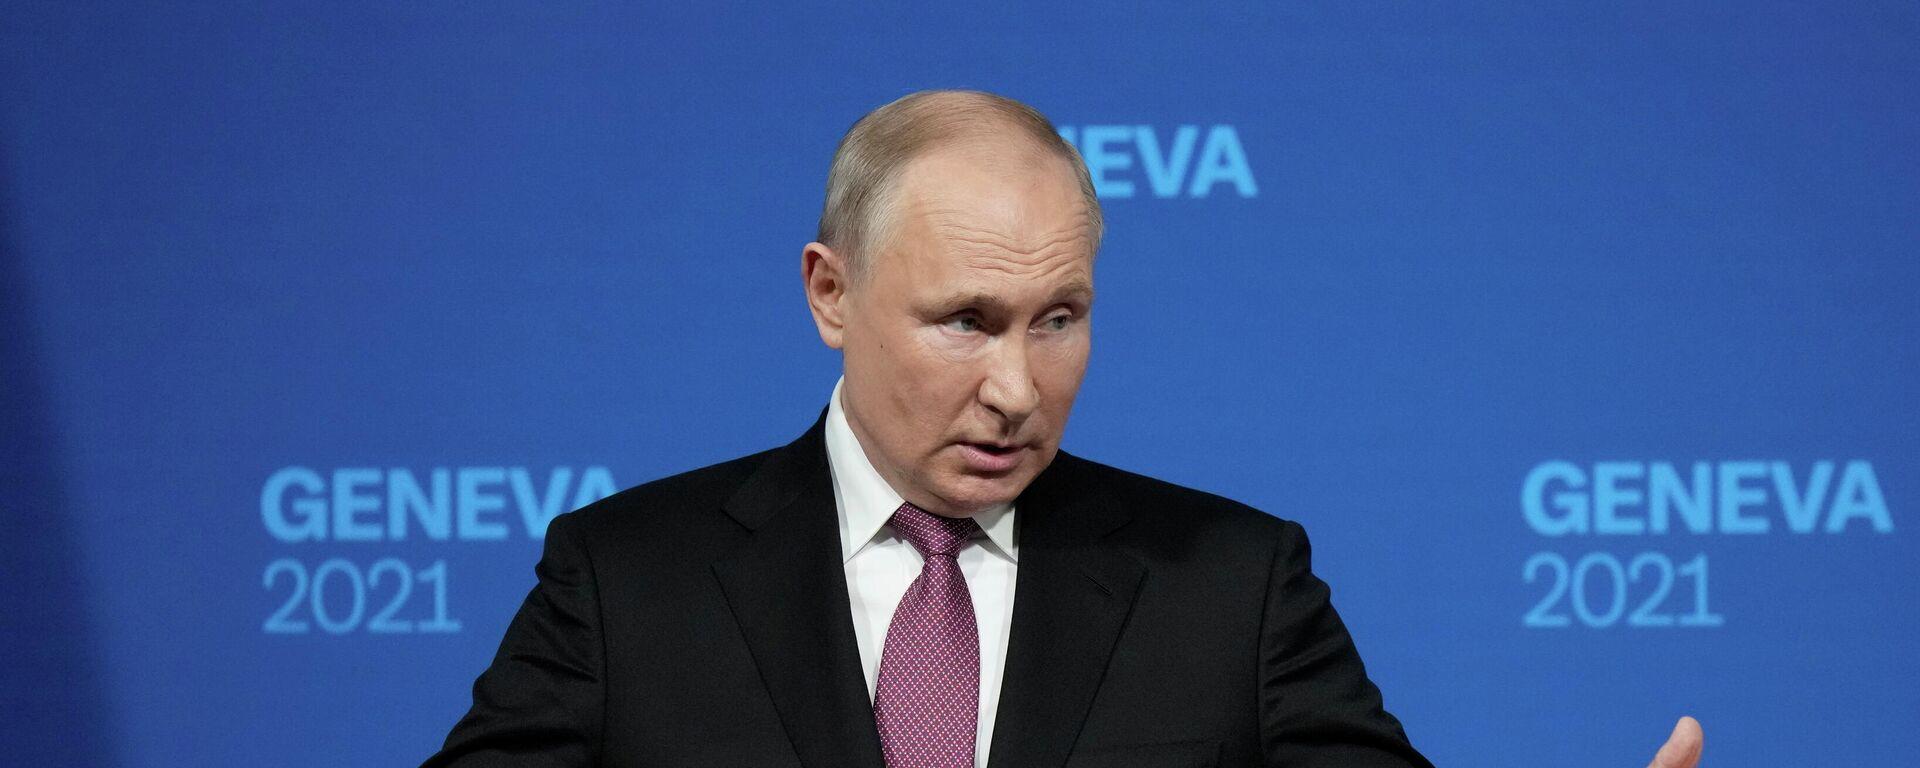 El presidente ruso, Vladímir Putin - Sputnik Mundo, 1920, 16.06.2021